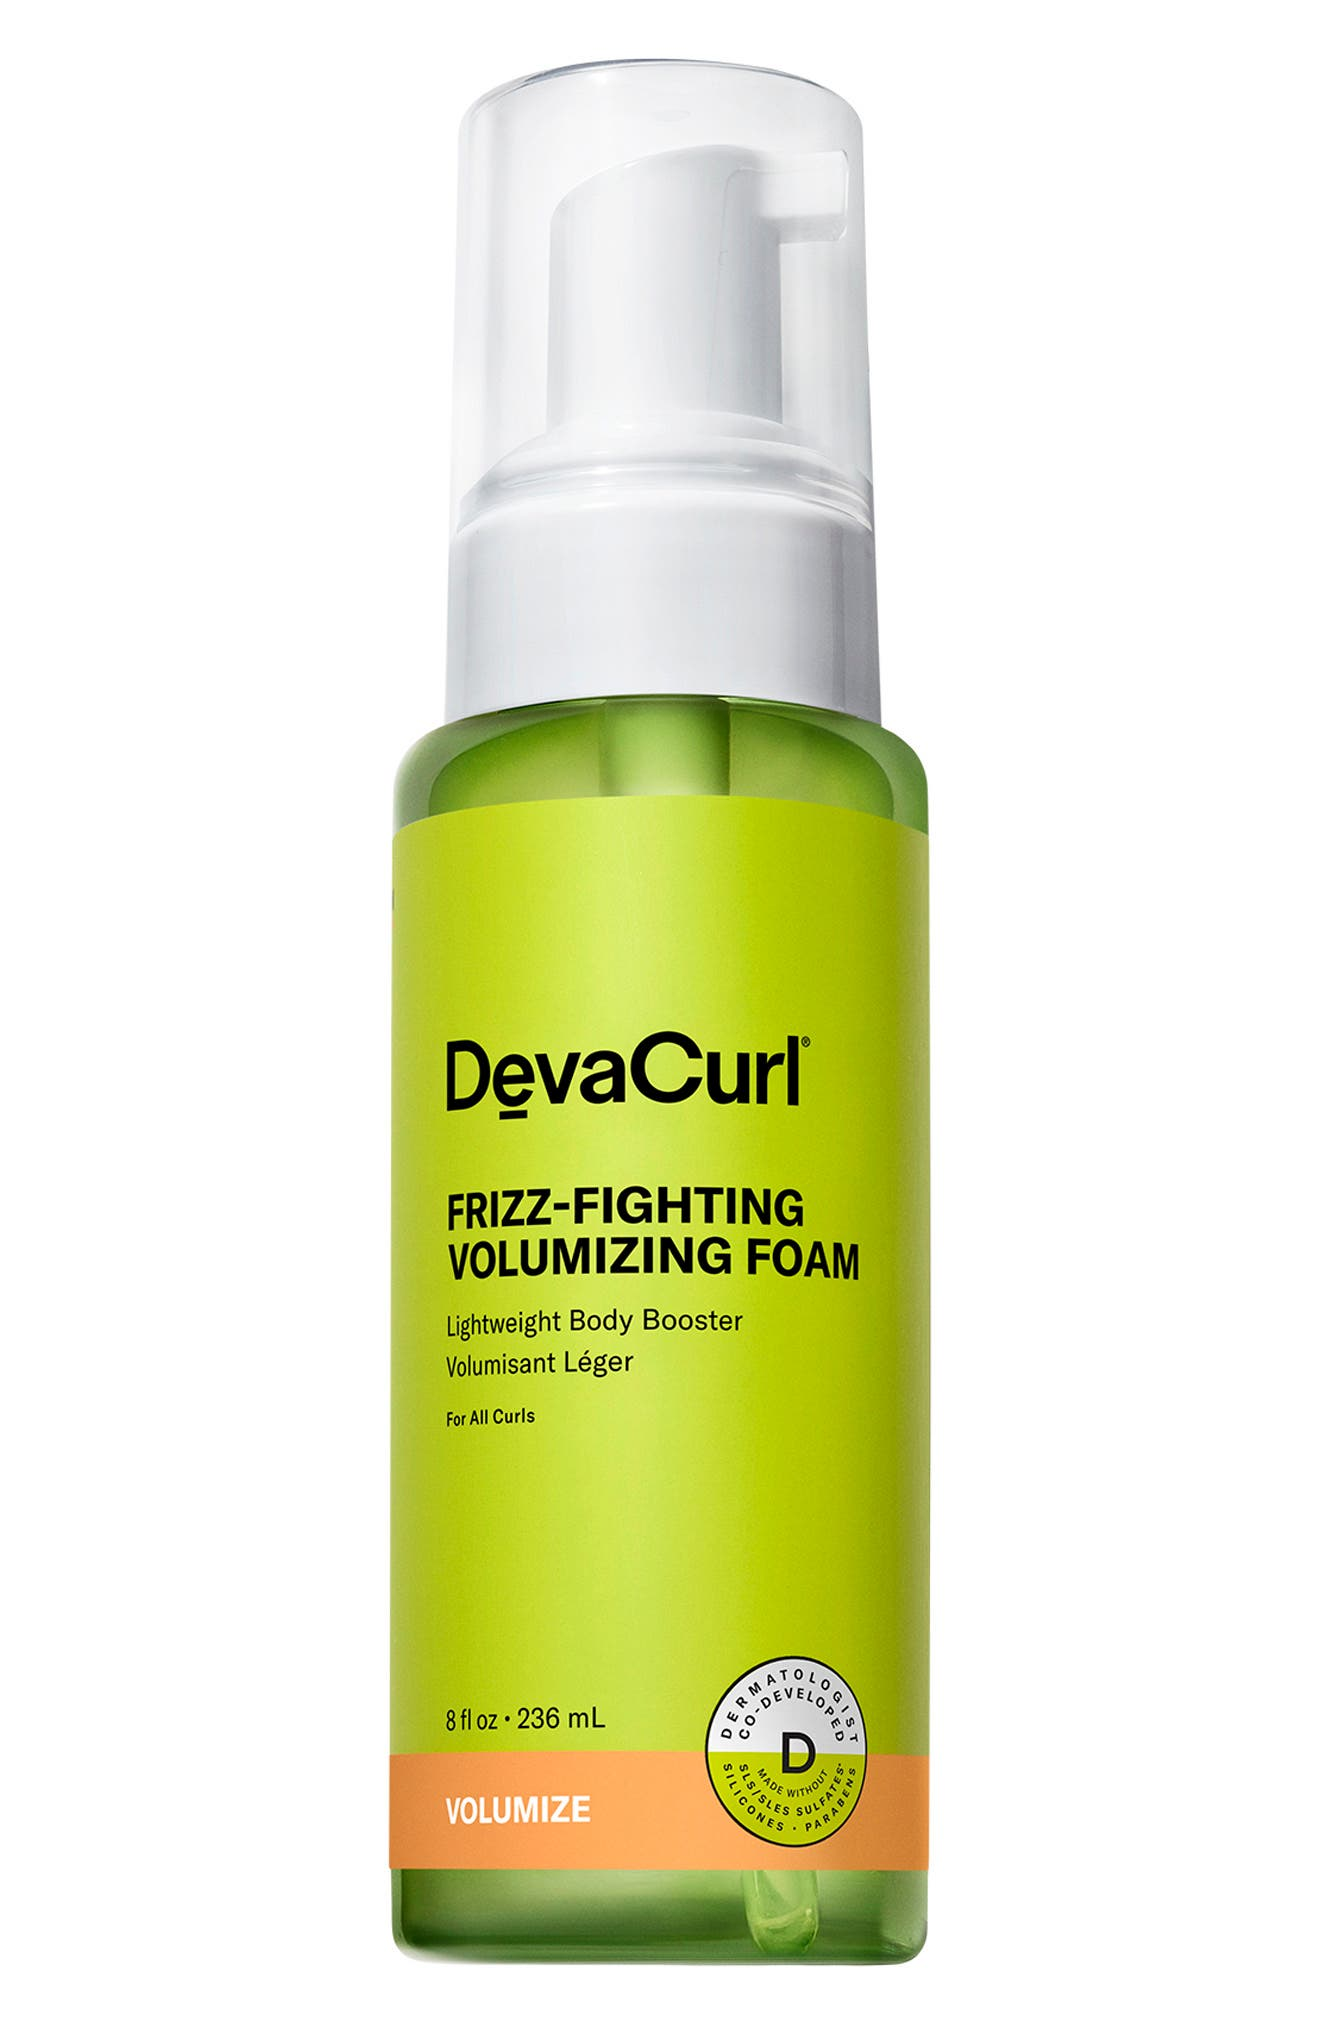 Frizz-Fighting Volumizing Foam